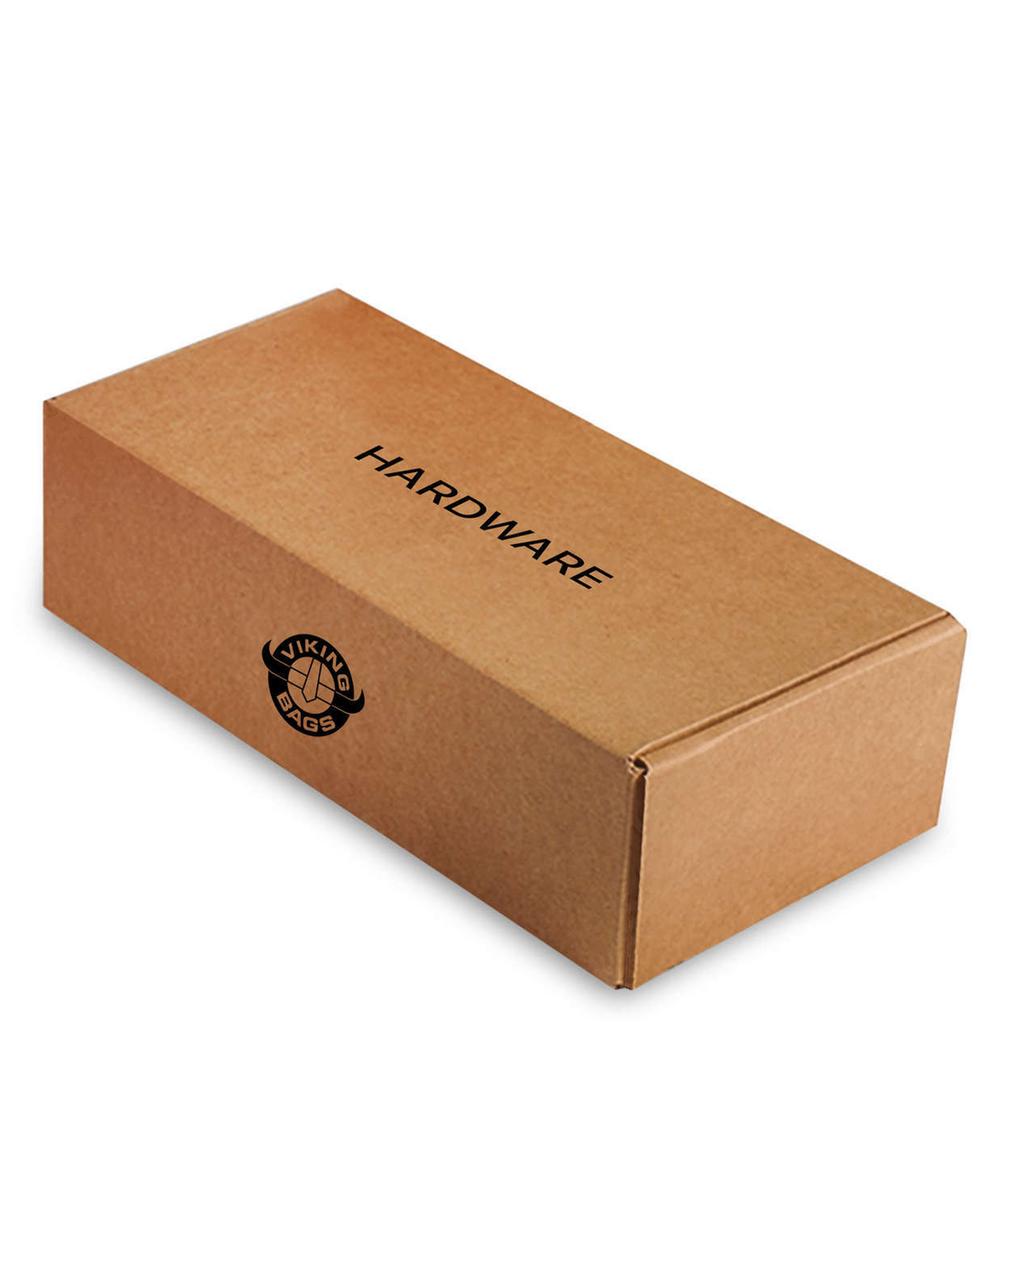 Triumph Thunderbird Lamellar Extra Large Shock Cutout Saddlebag Box